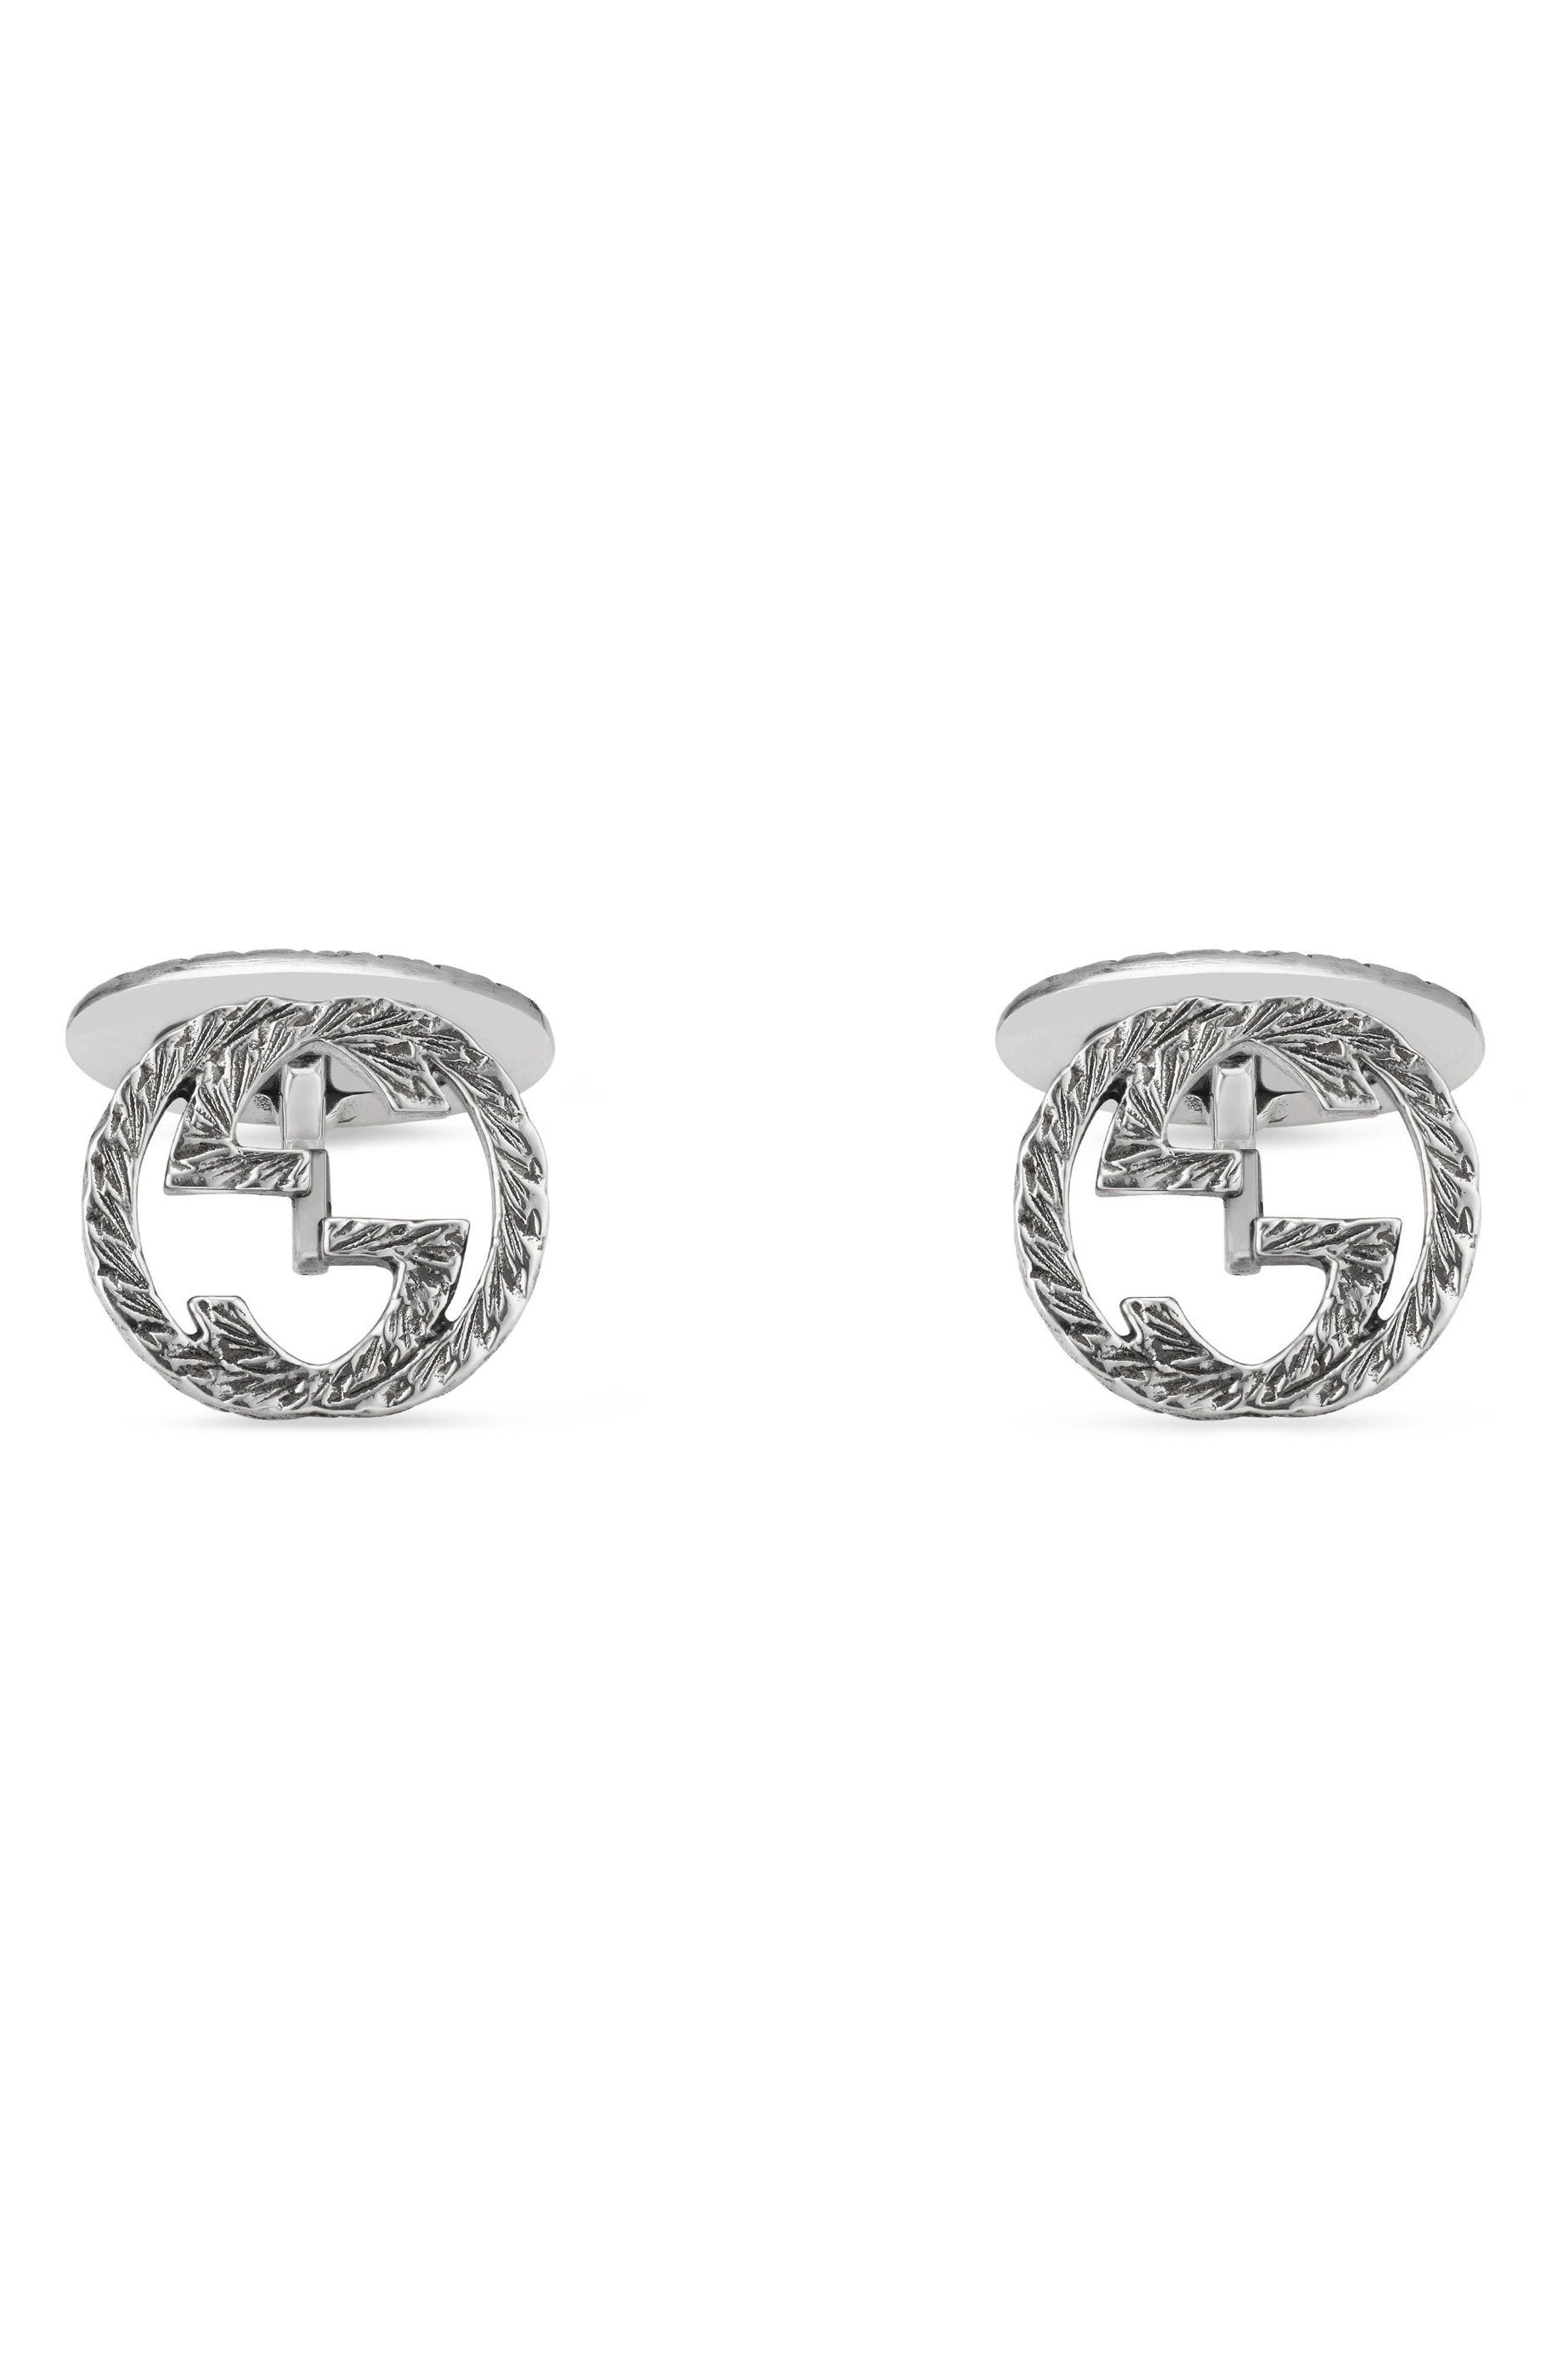 Main Image - Gucci Interlocking G Cuff Links